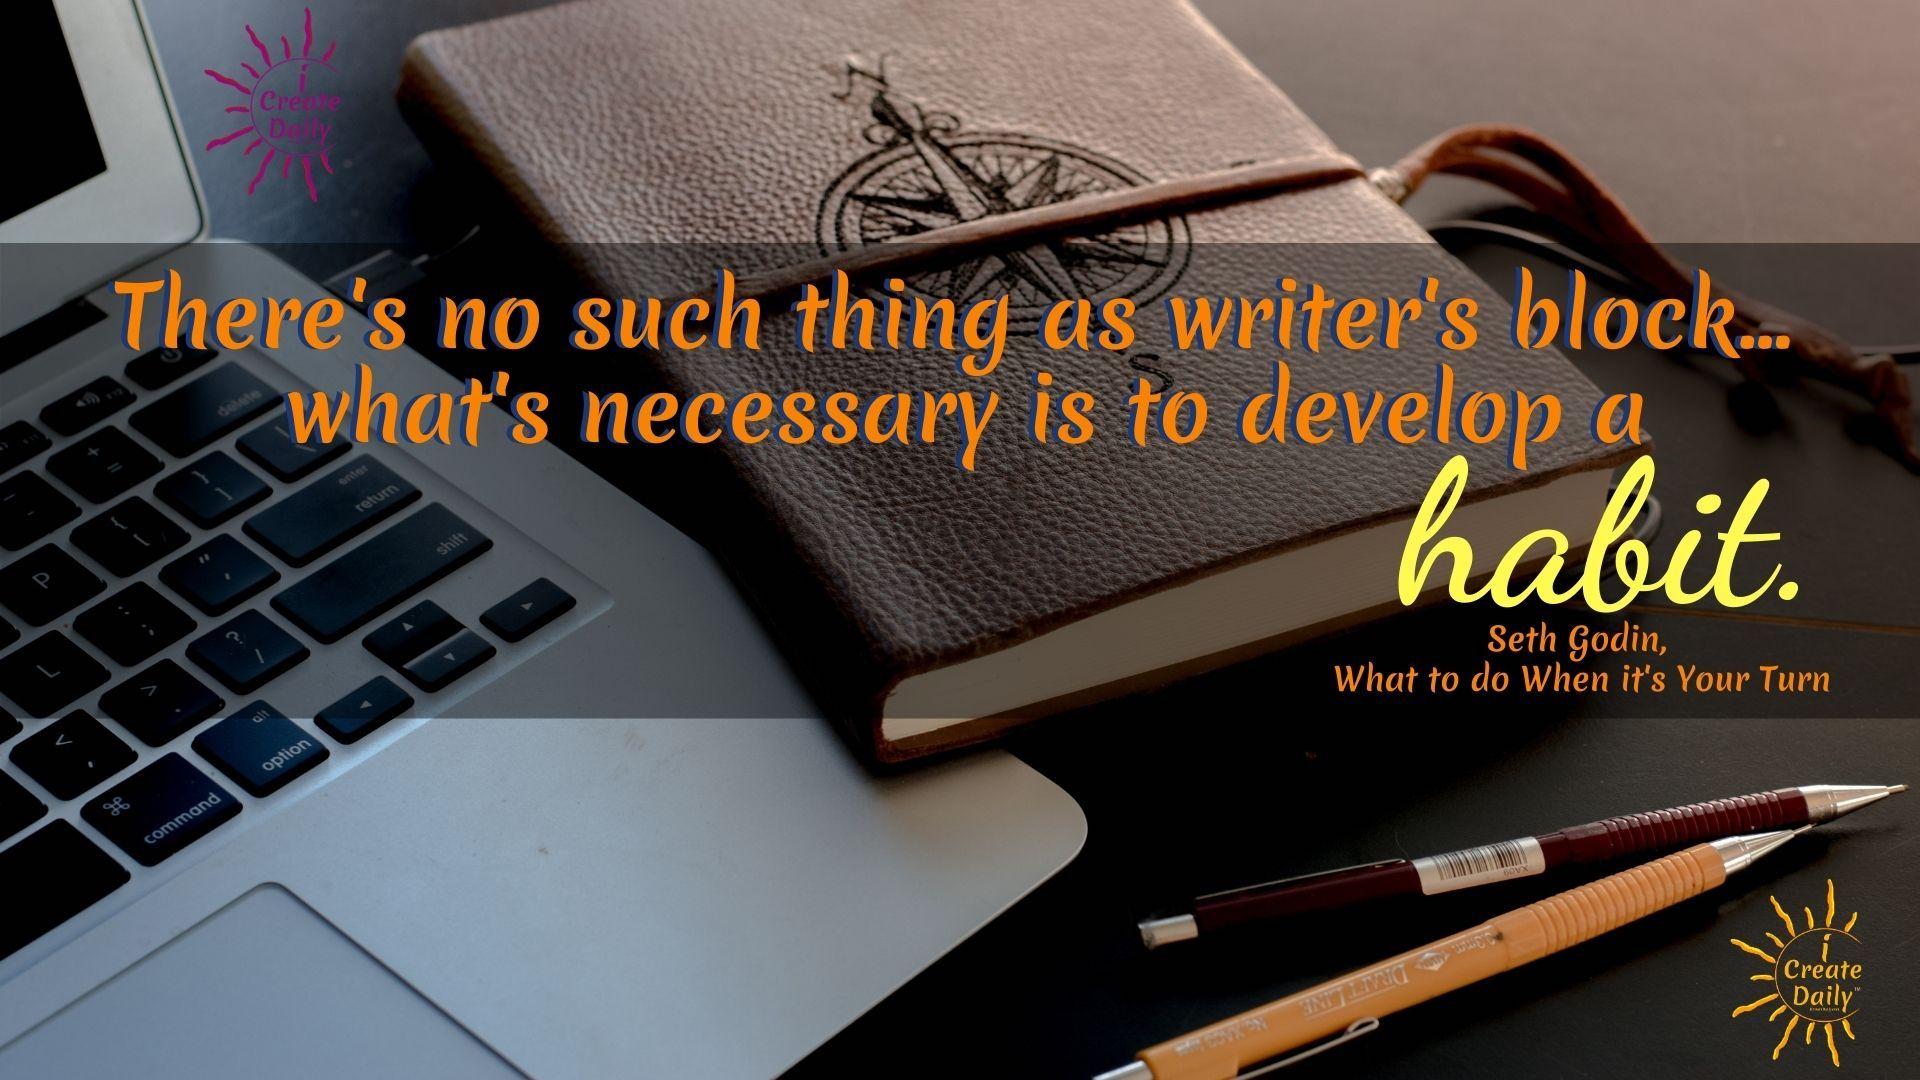 SETH GODIN QUOTE - Habits quote, Writers Block Quote